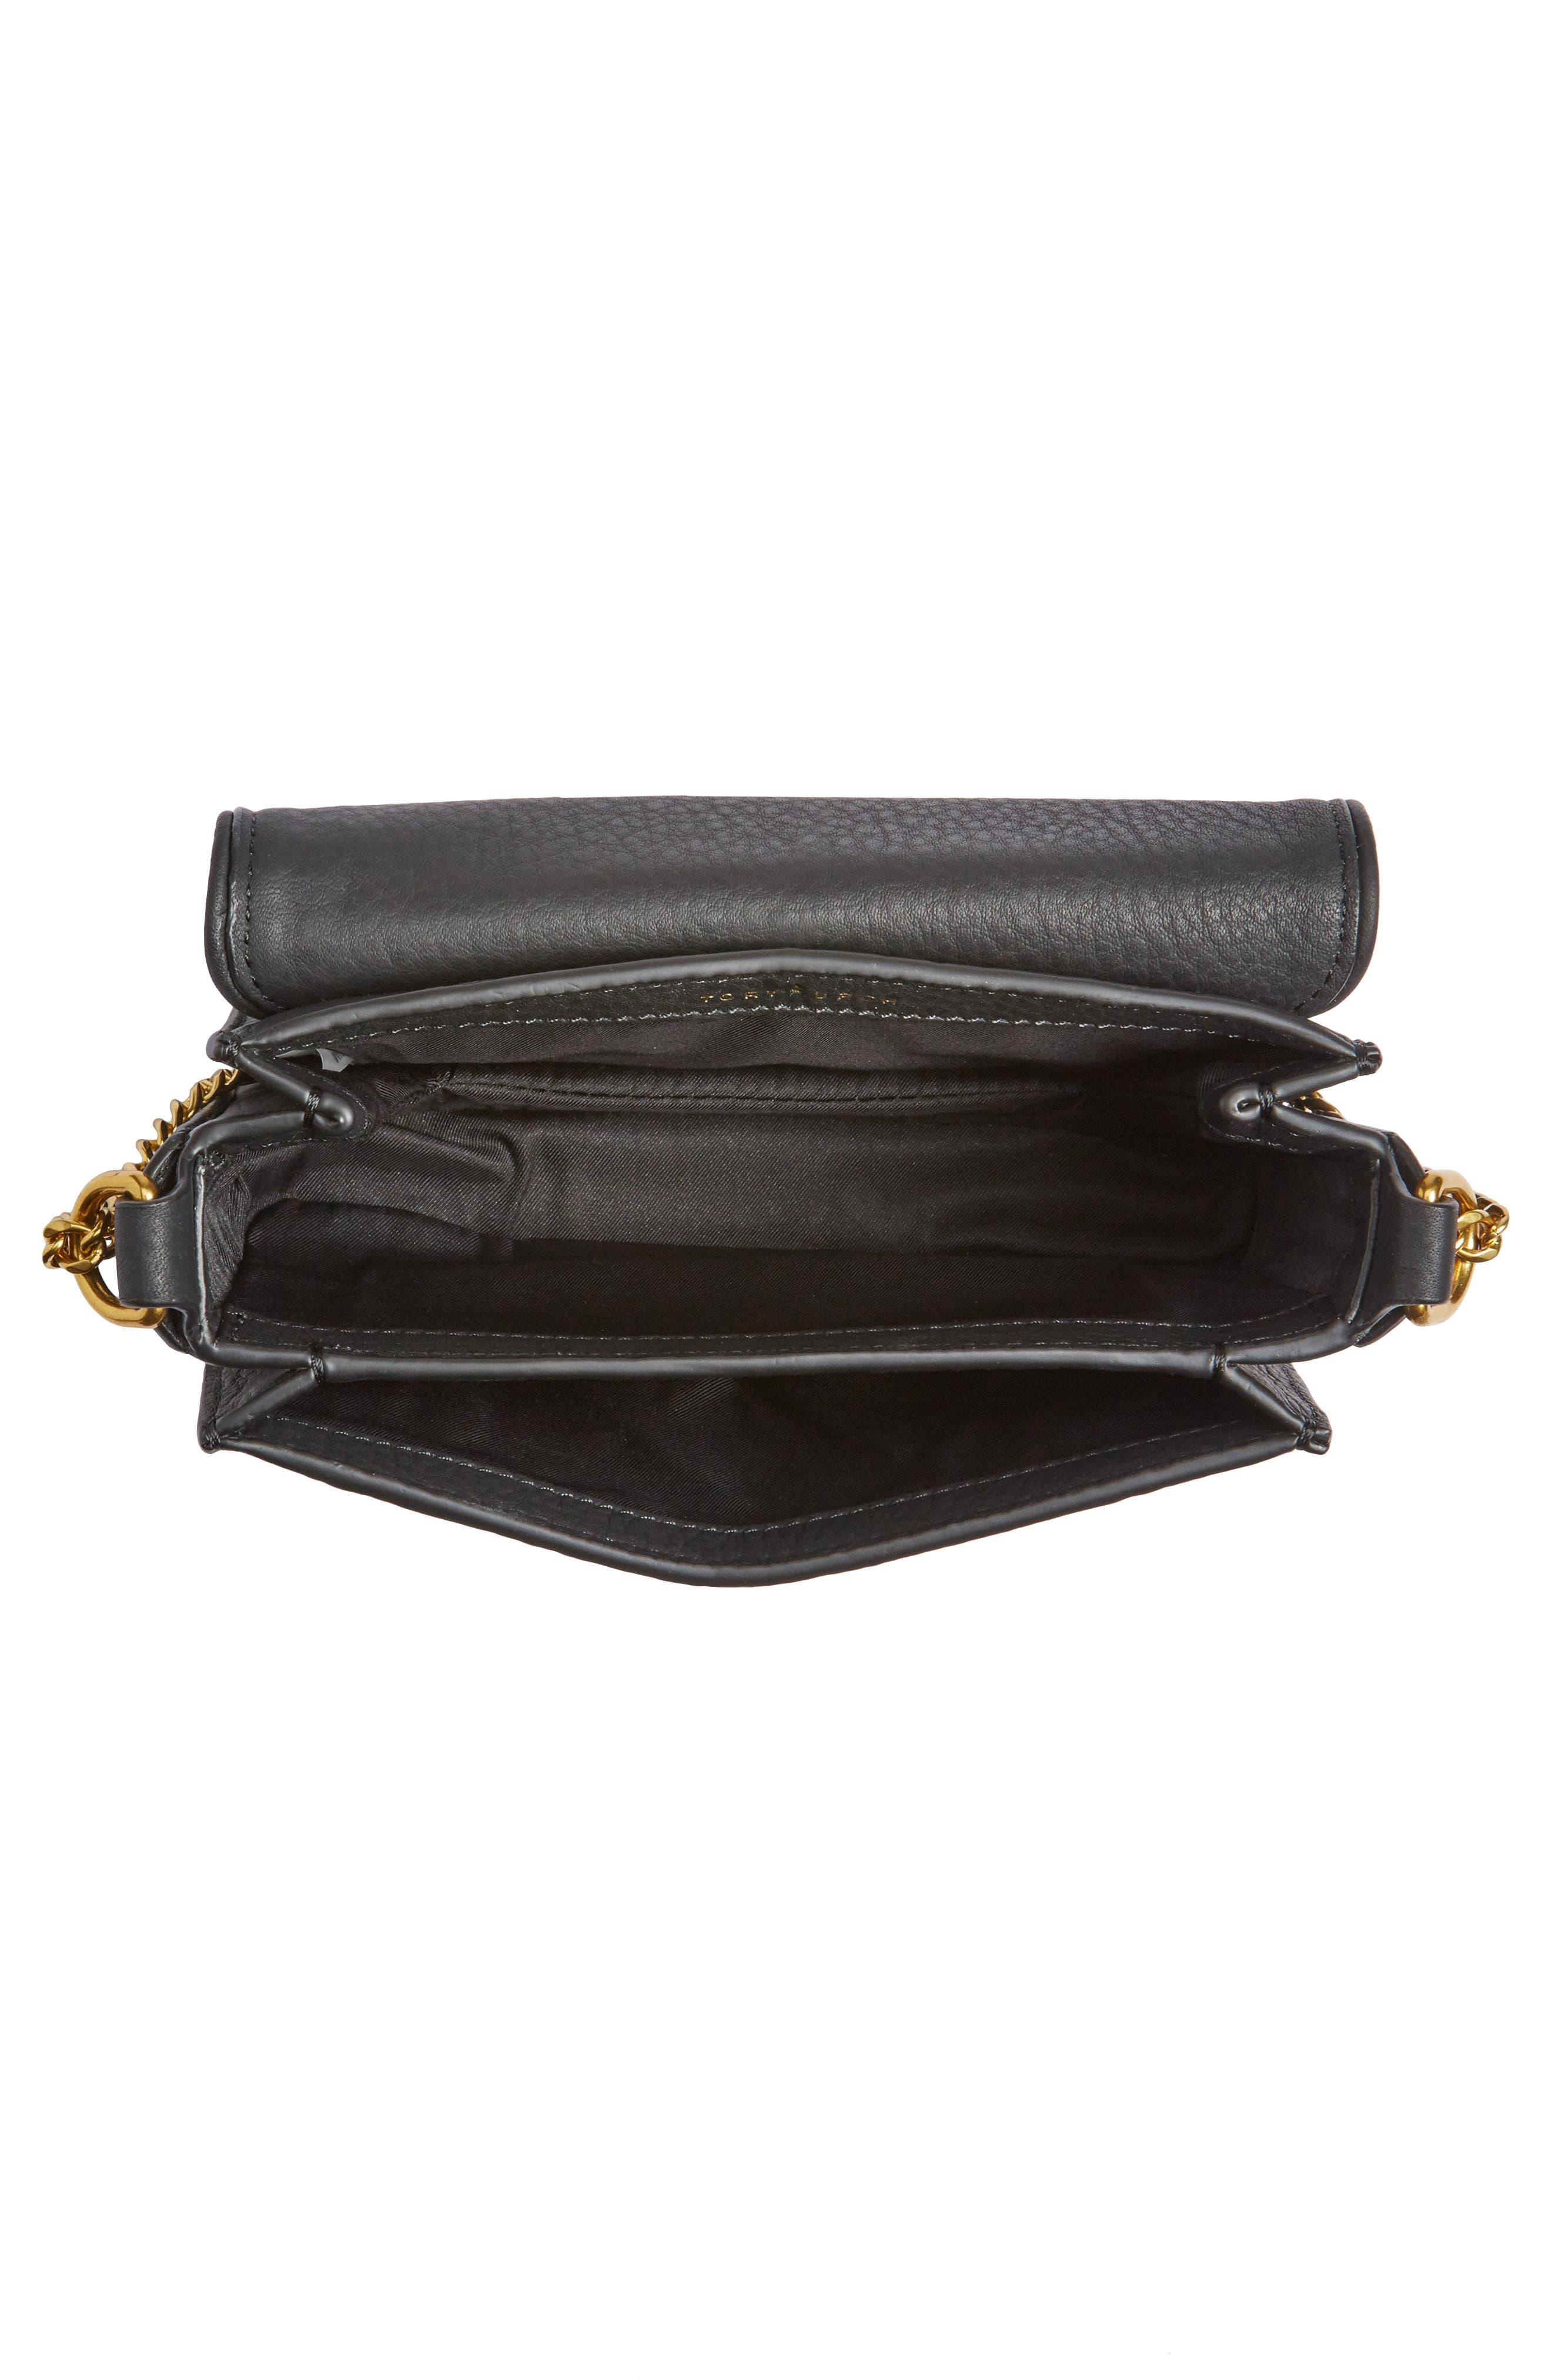 TORY BURCH,                             Mini Chelsea Leather Convertible Crossbody Bag,                             Alternate thumbnail 4, color,                             001